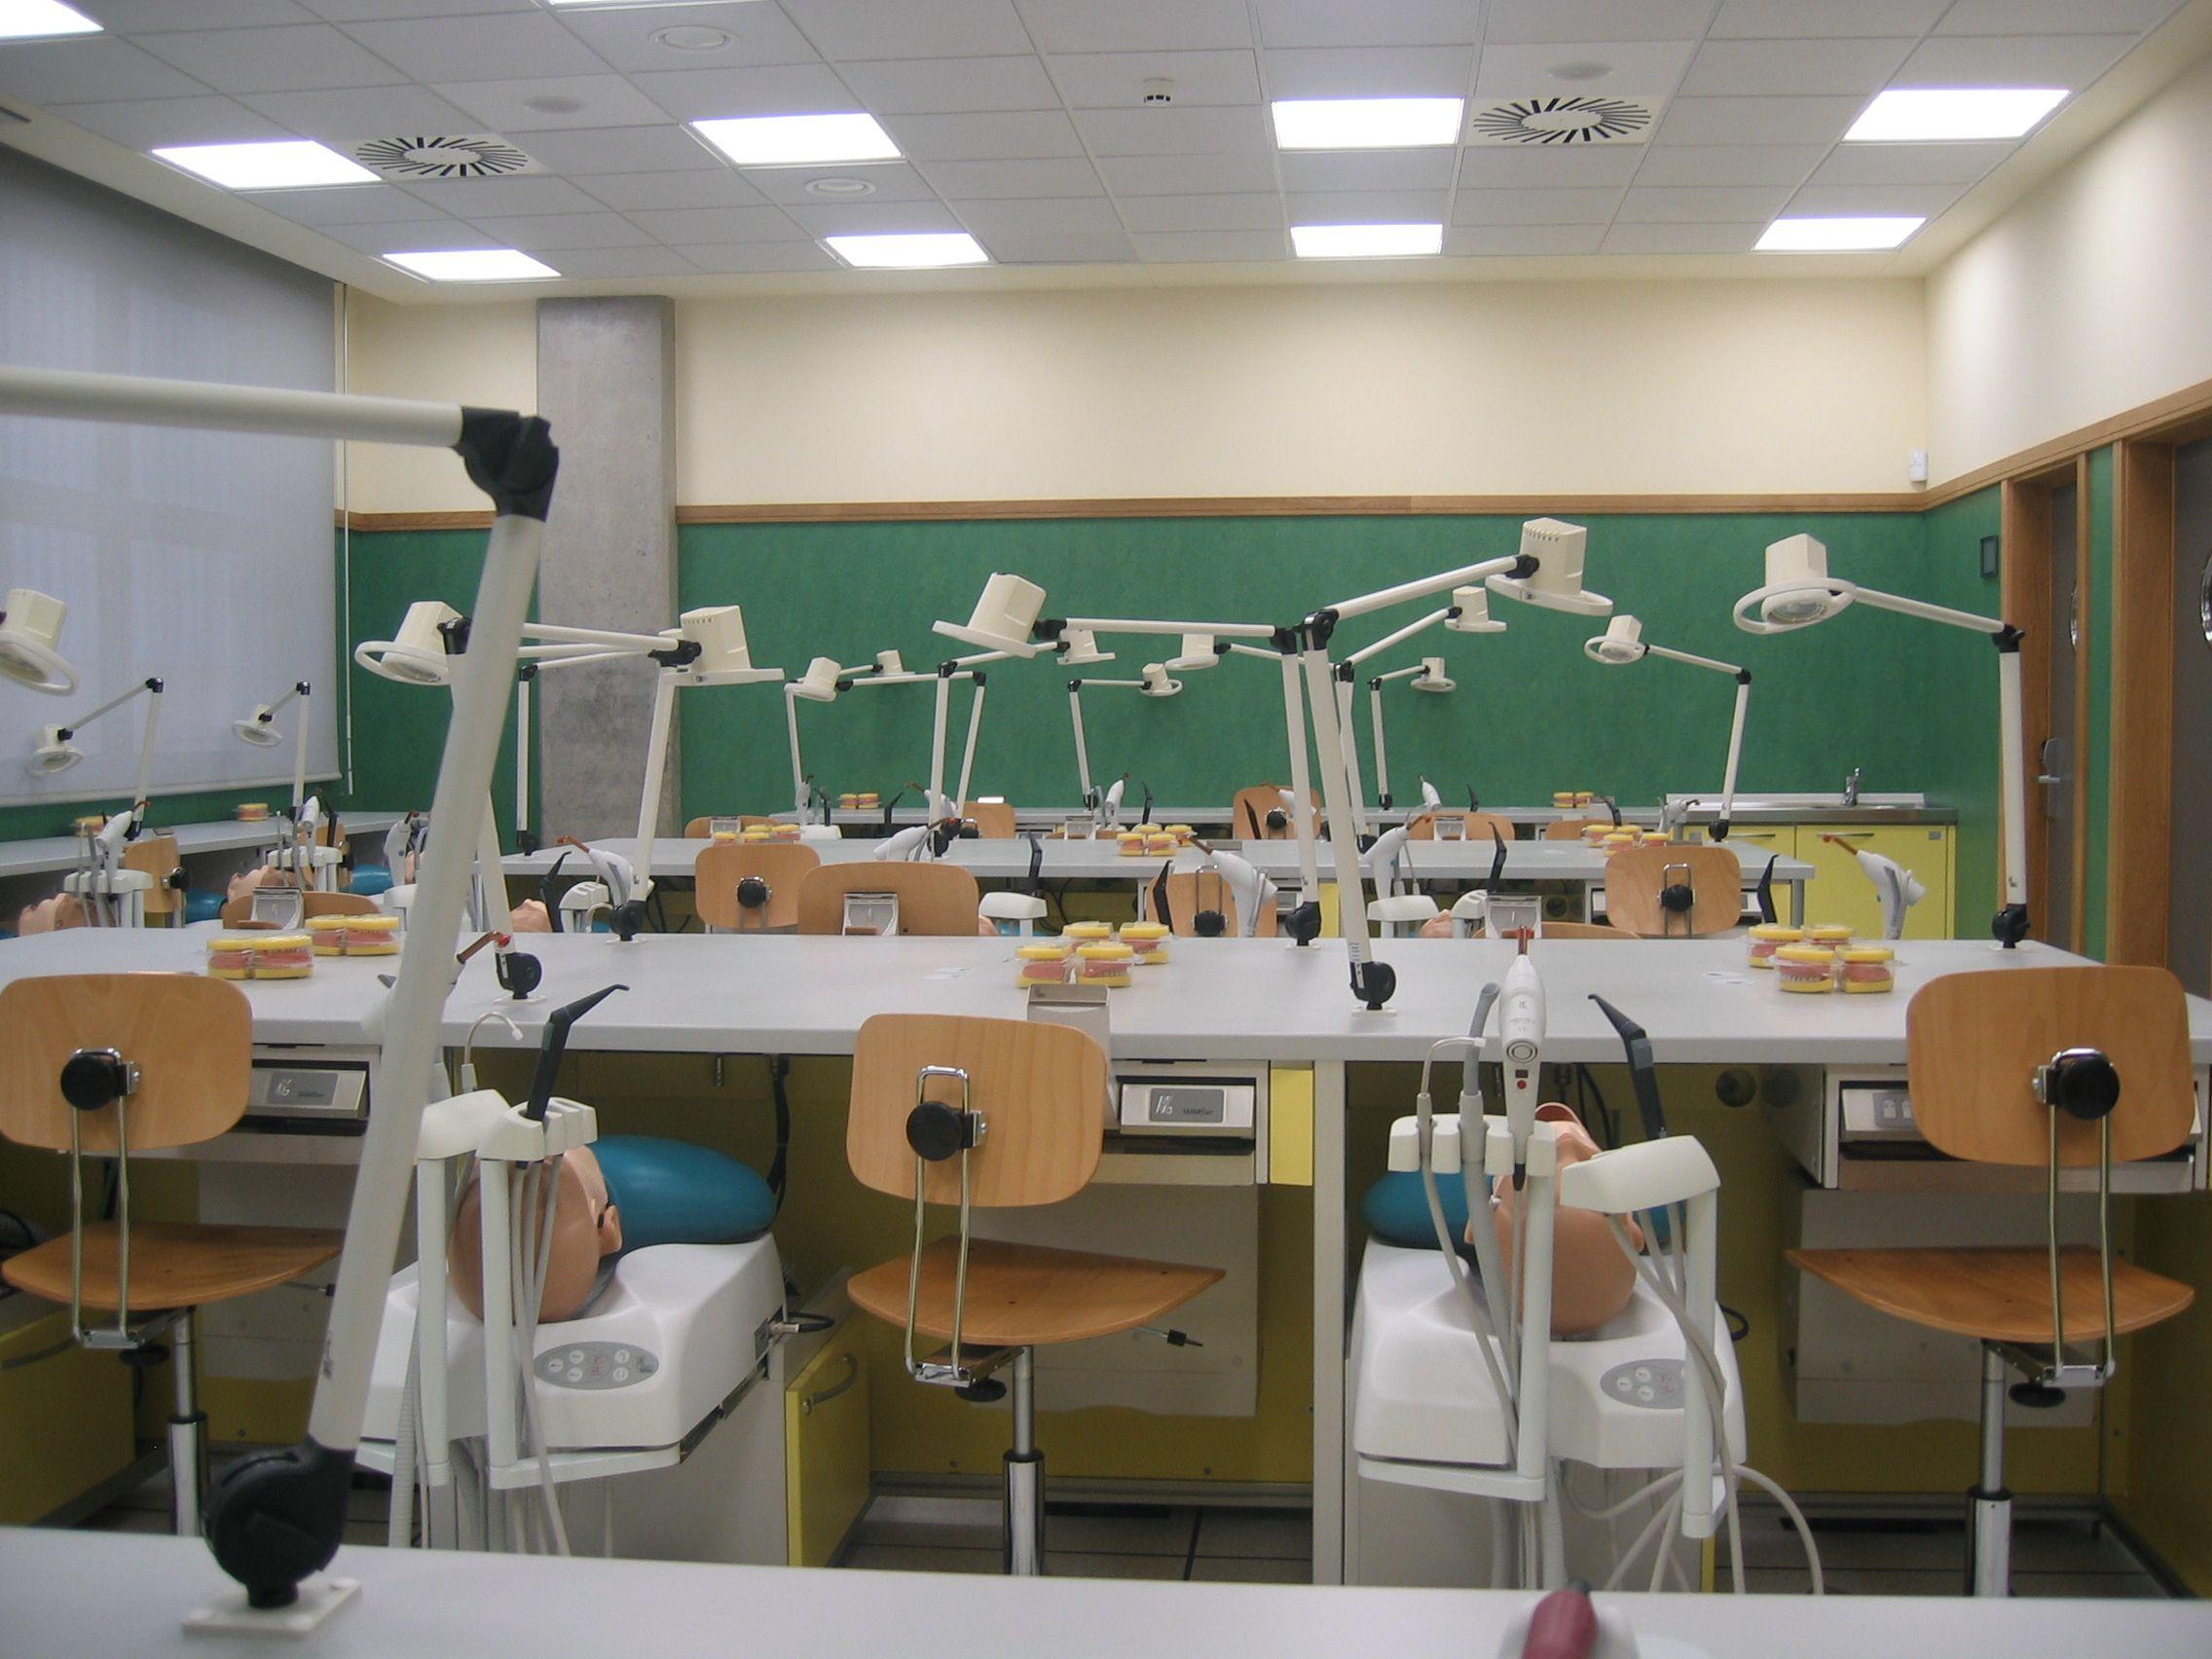 Dentistry at University CEU Cardenal Herrera